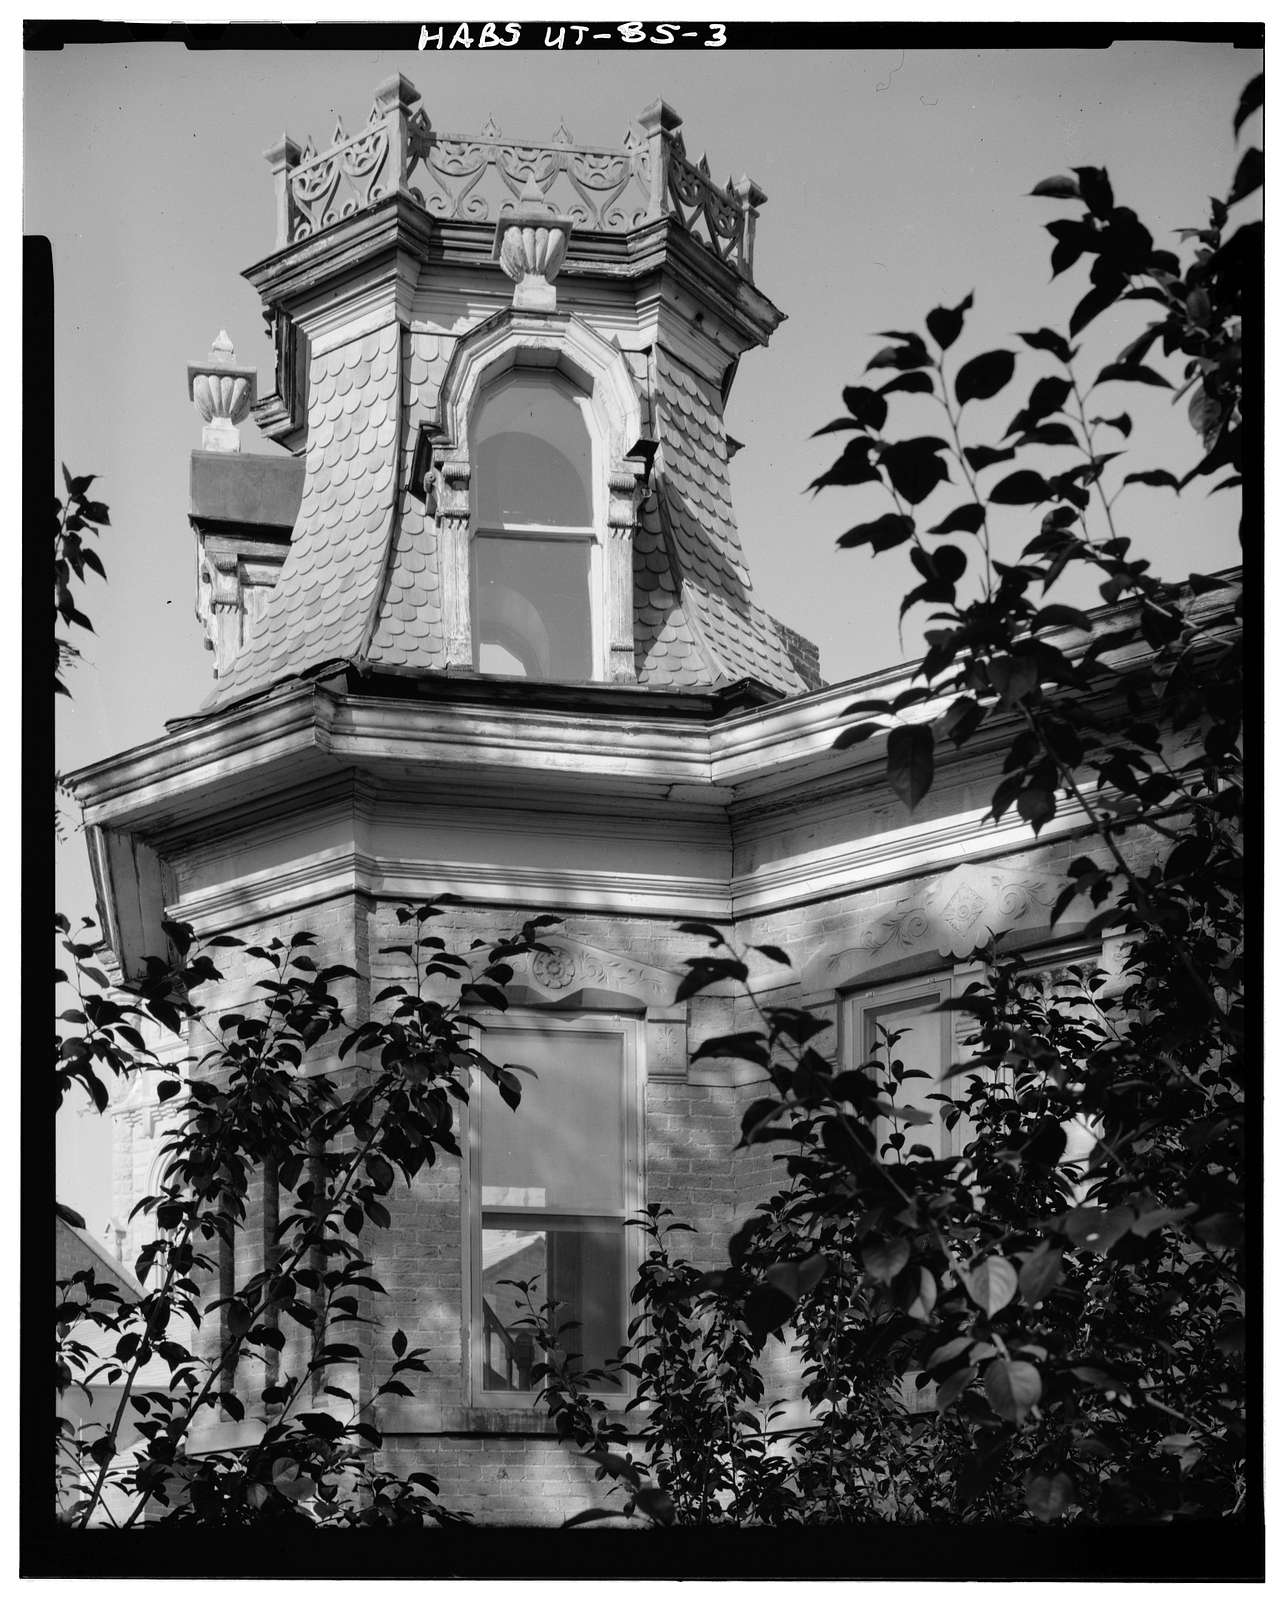 William H. Culmer House, 33 C Street, Salt Lake City, Salt Lake County, UT